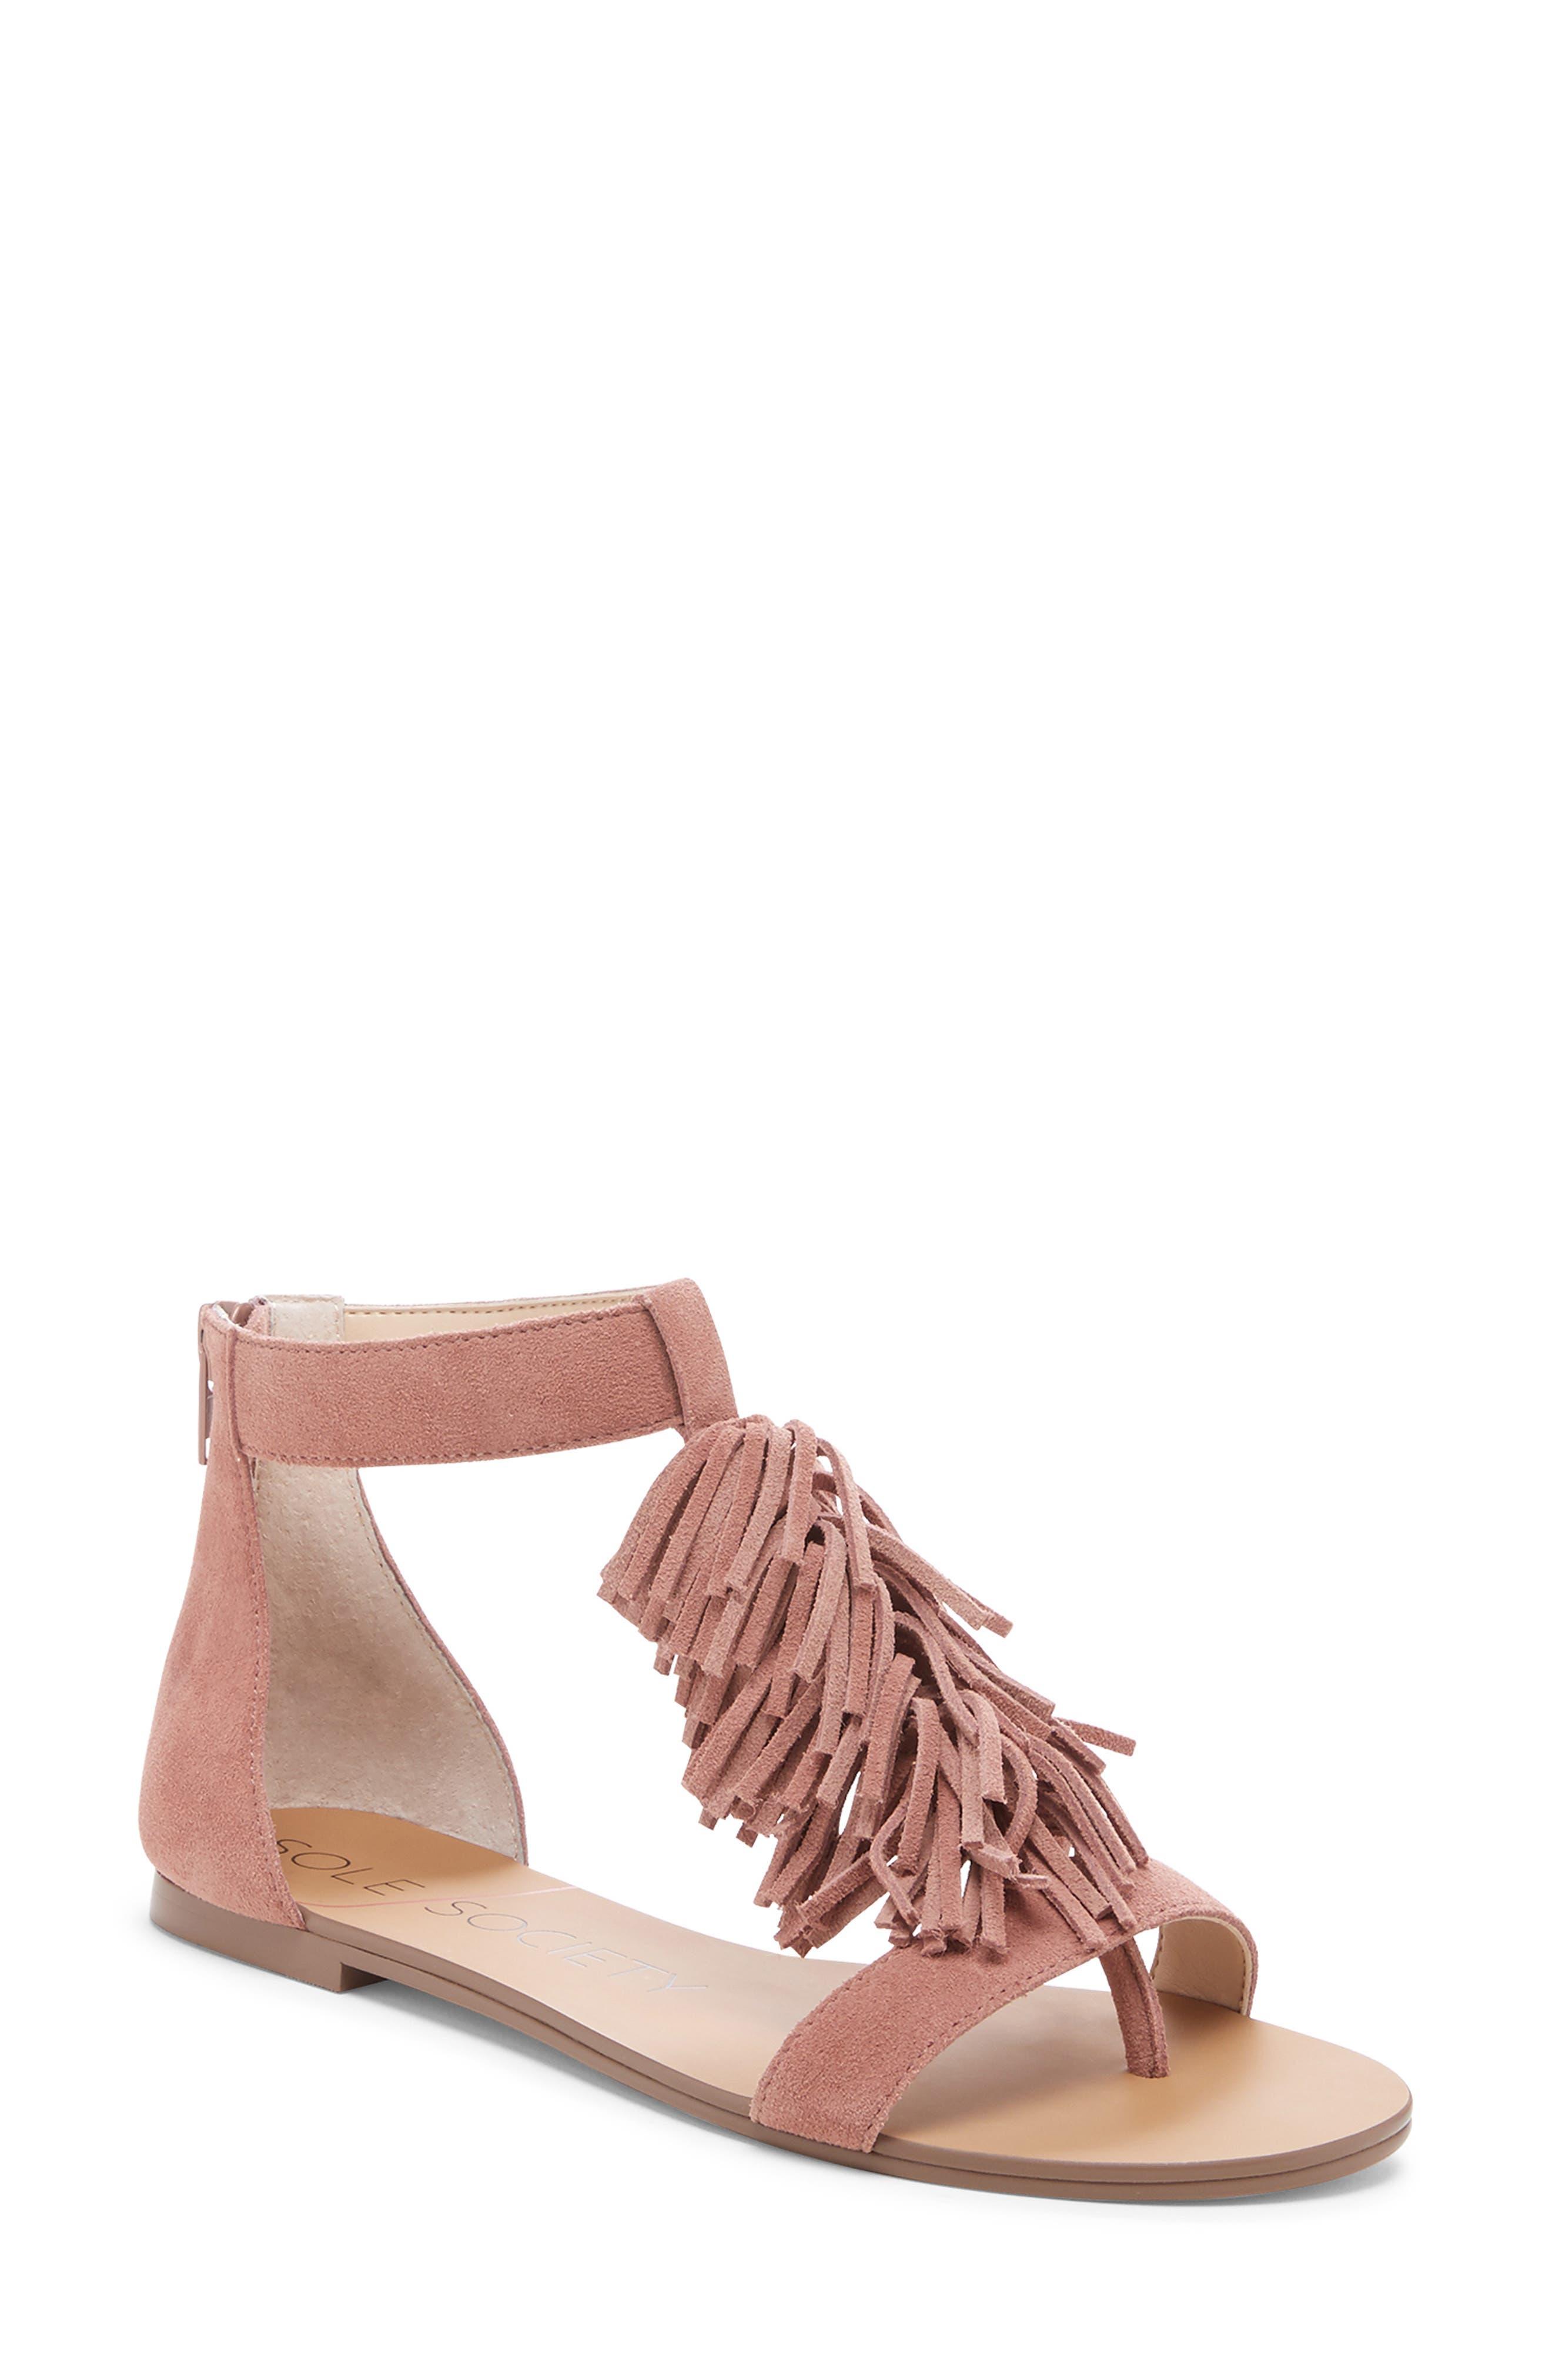 SOLE SOCIETY 'Koa' Fringe T-Strap Flat Sandal, Main, color, MOD MAUVE SUEDE